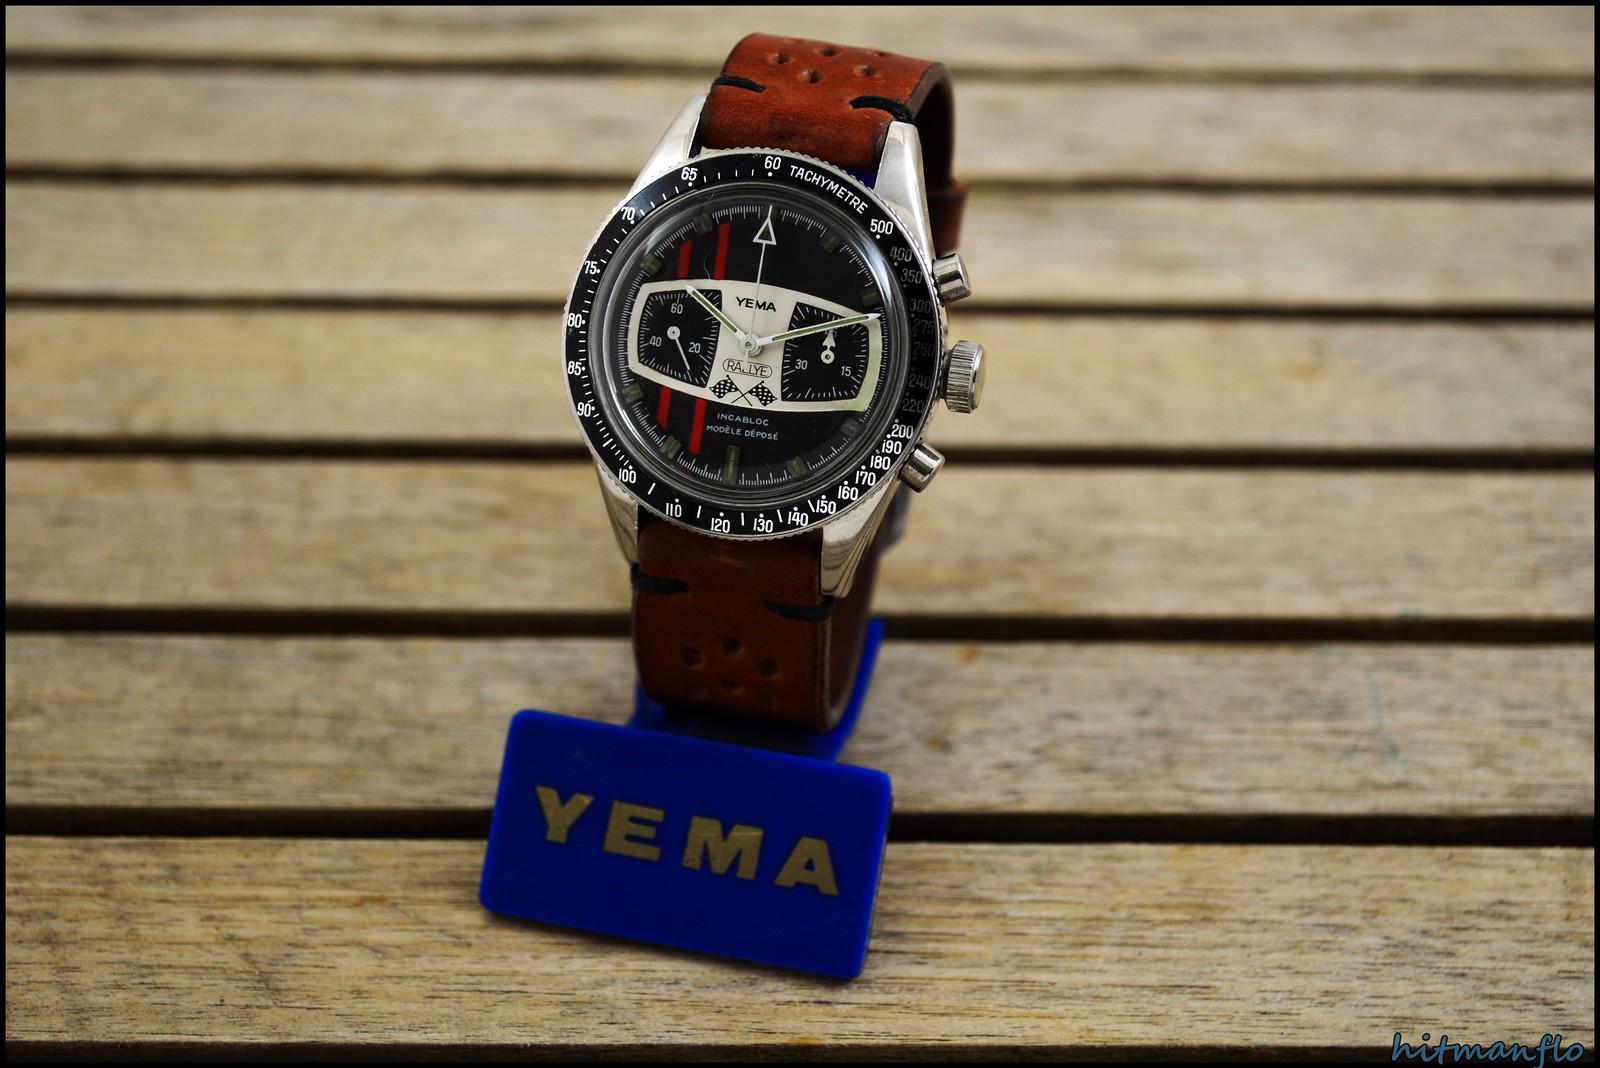 Yema Rallye vintage dite Andretti ou non,Brown Sugar,Formica  49780961801_a0df676ef2_h